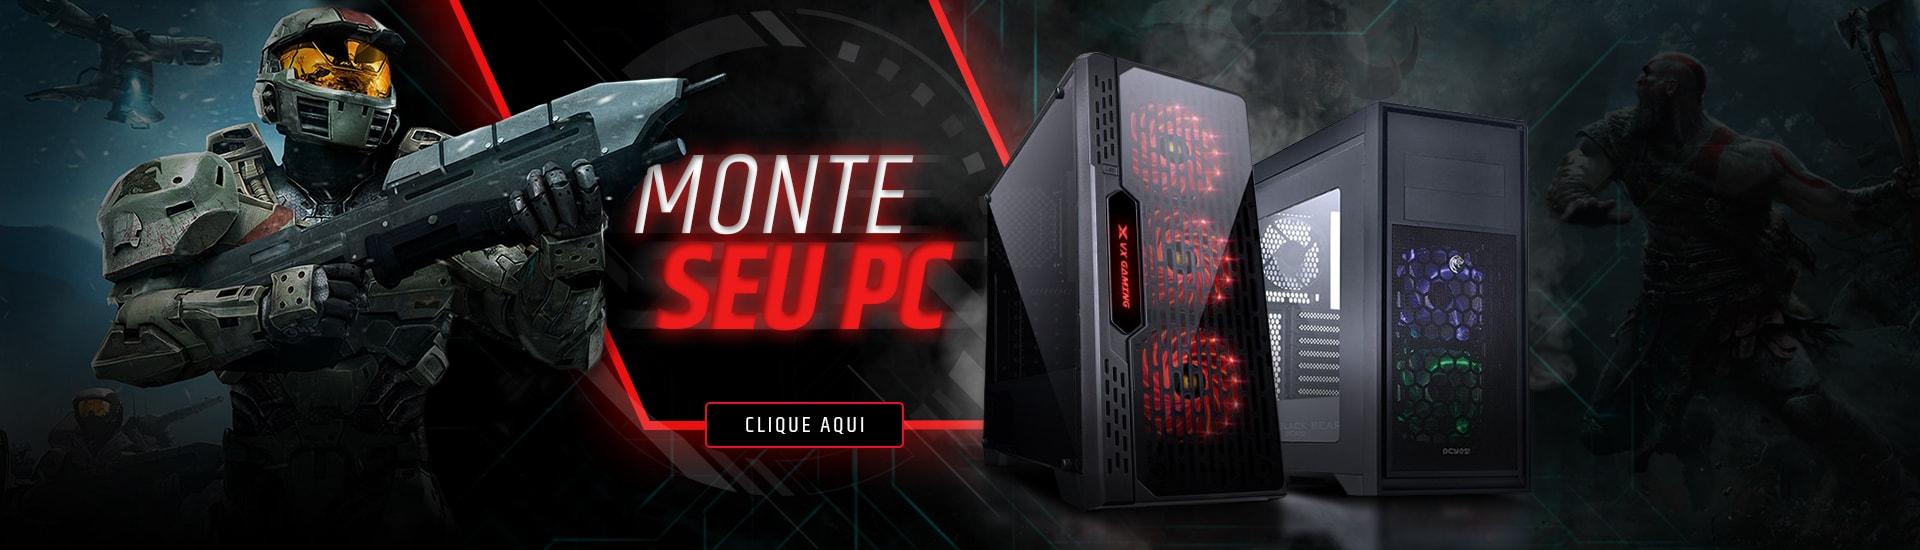 Monte seu PC